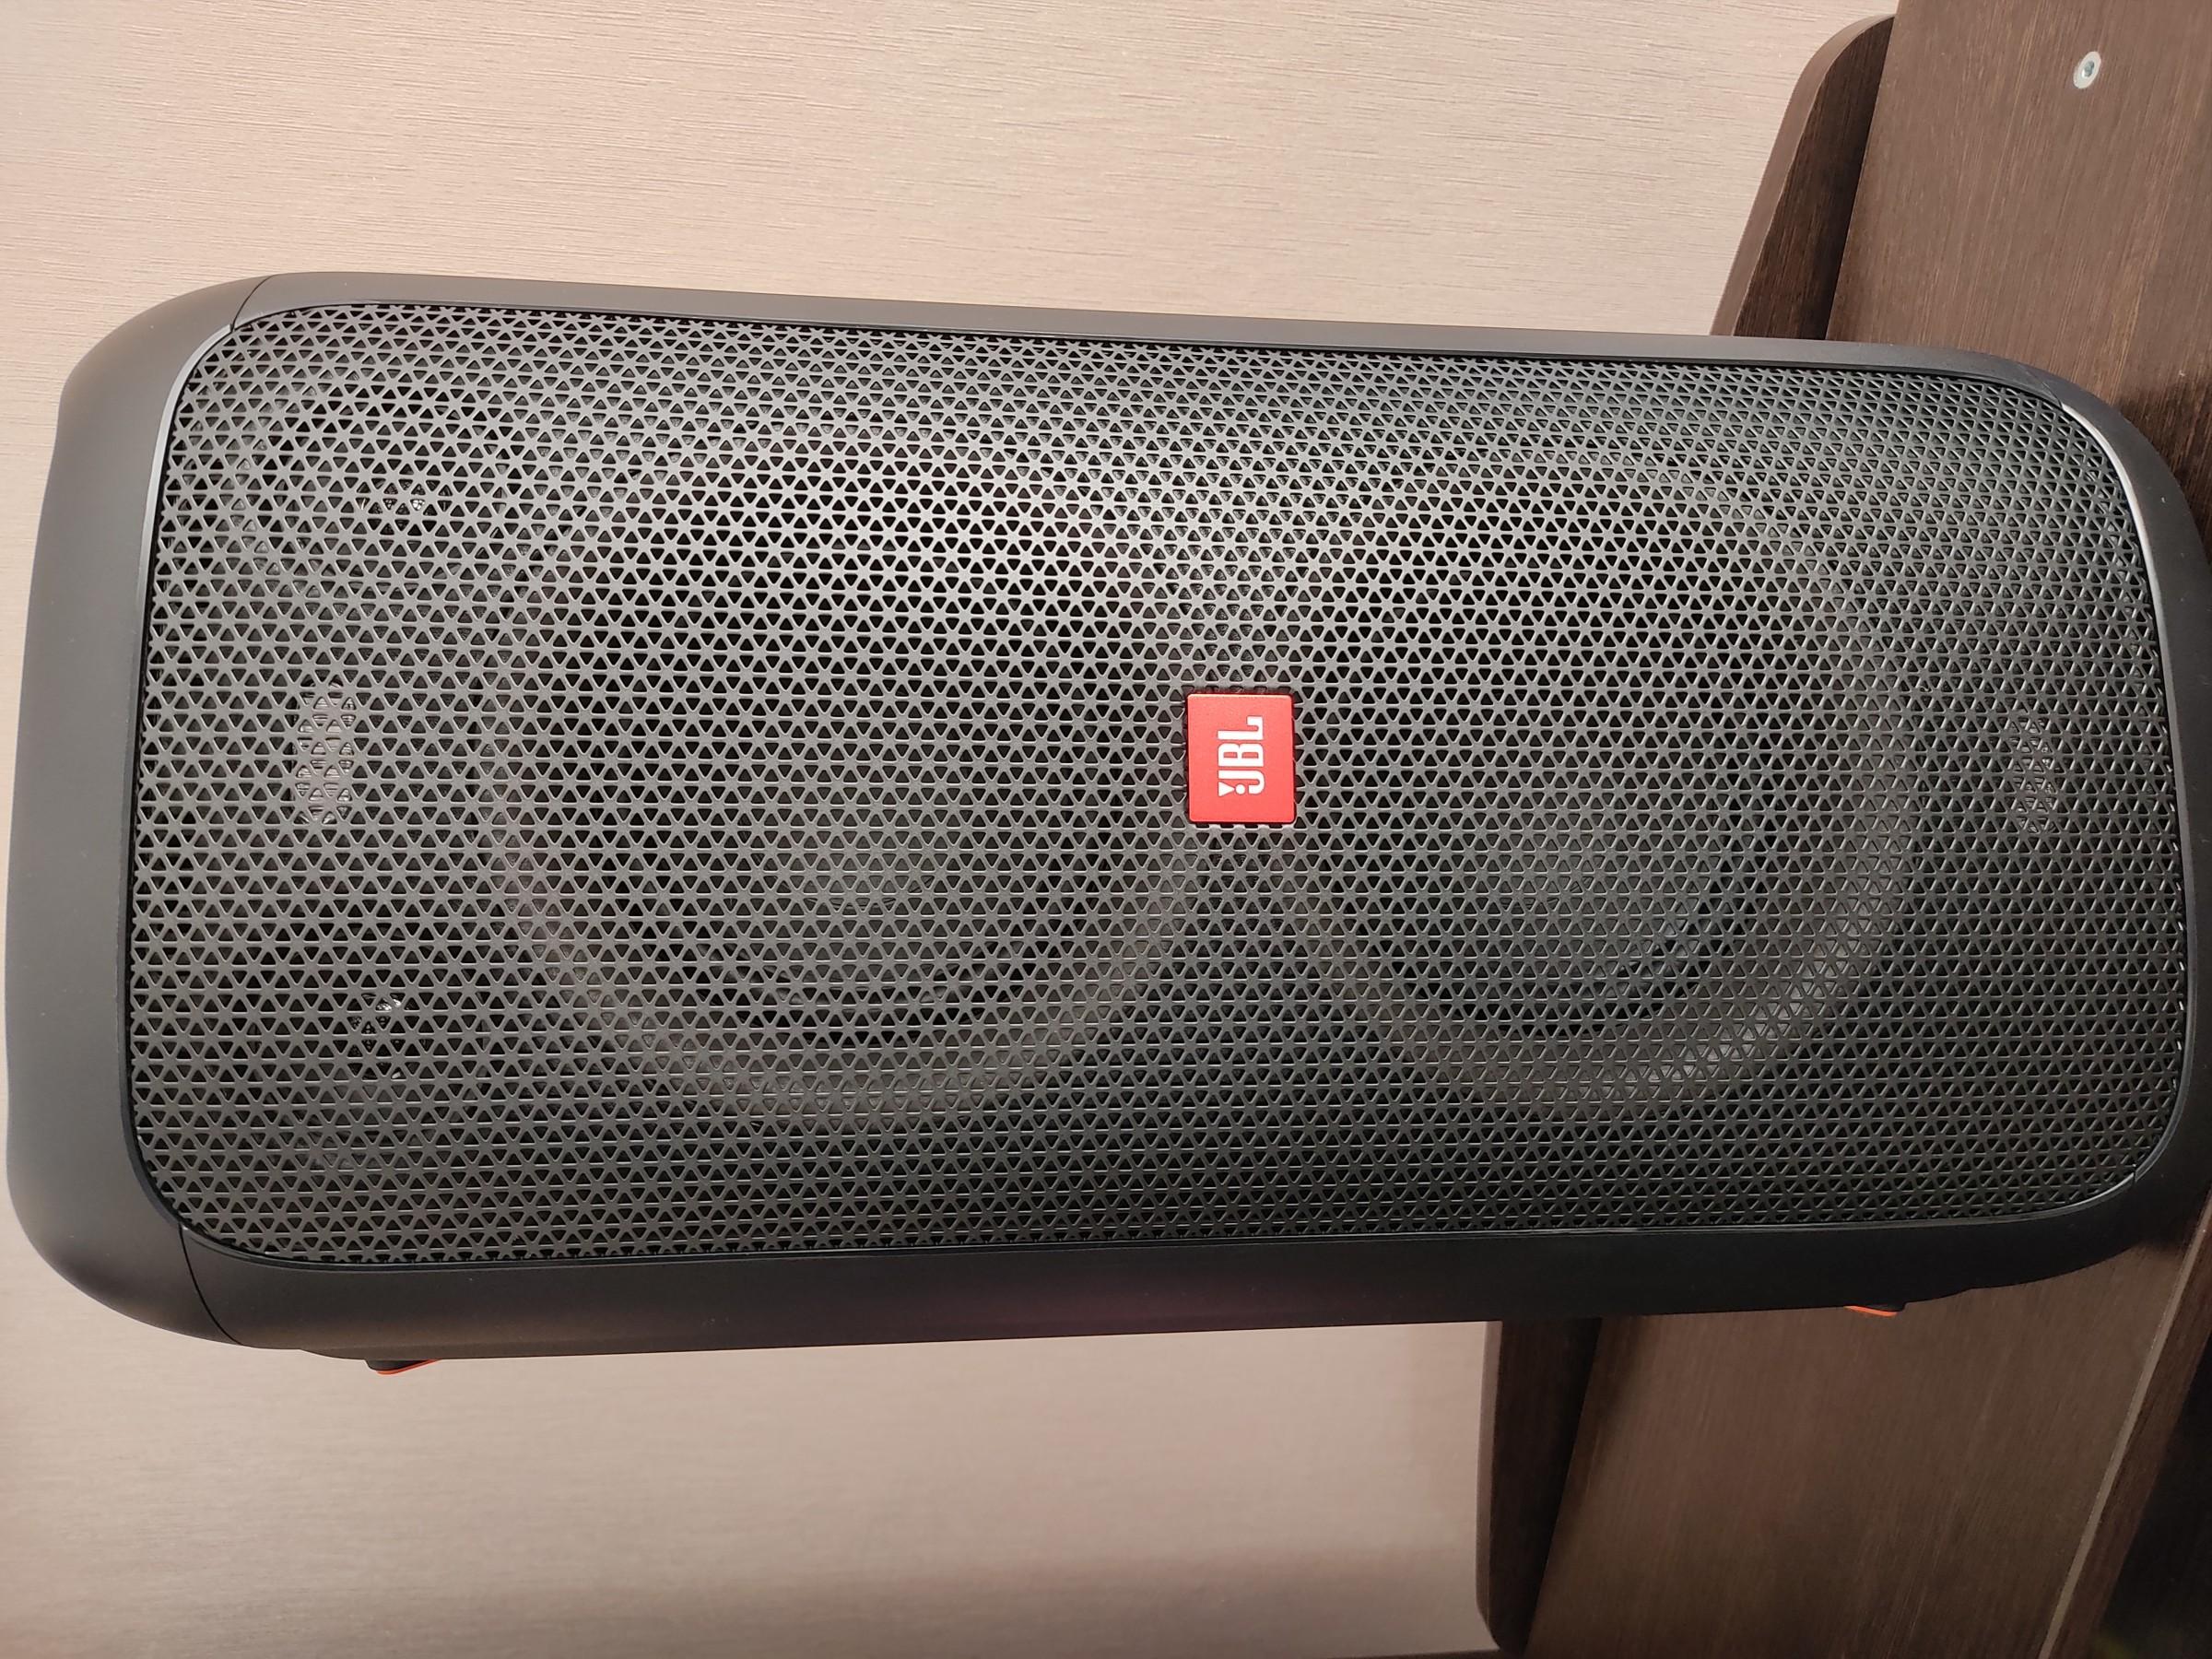 Обзор беспроводной аудиосистемы JBL Party Box 100 Black (JBLPARTYBOX100RU)